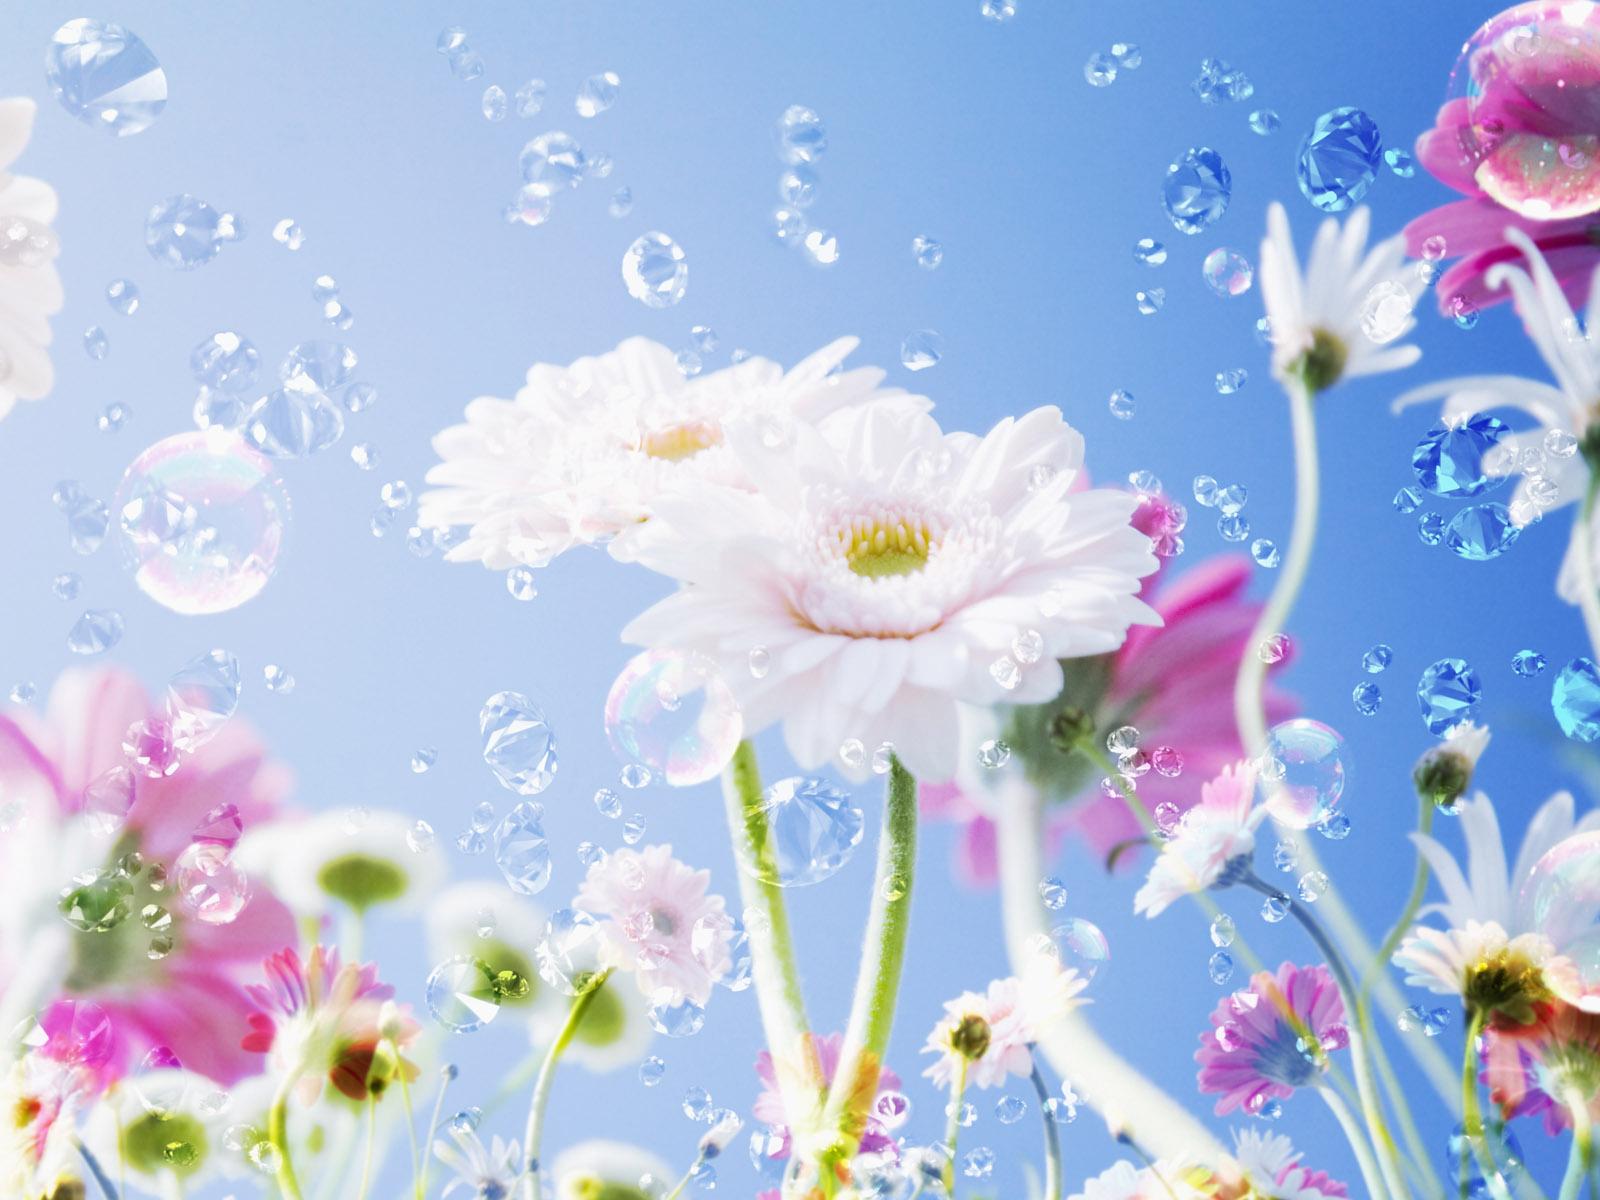 Pretty Flower Backgrounds wallpaper wallpaper hd background 1600x1200